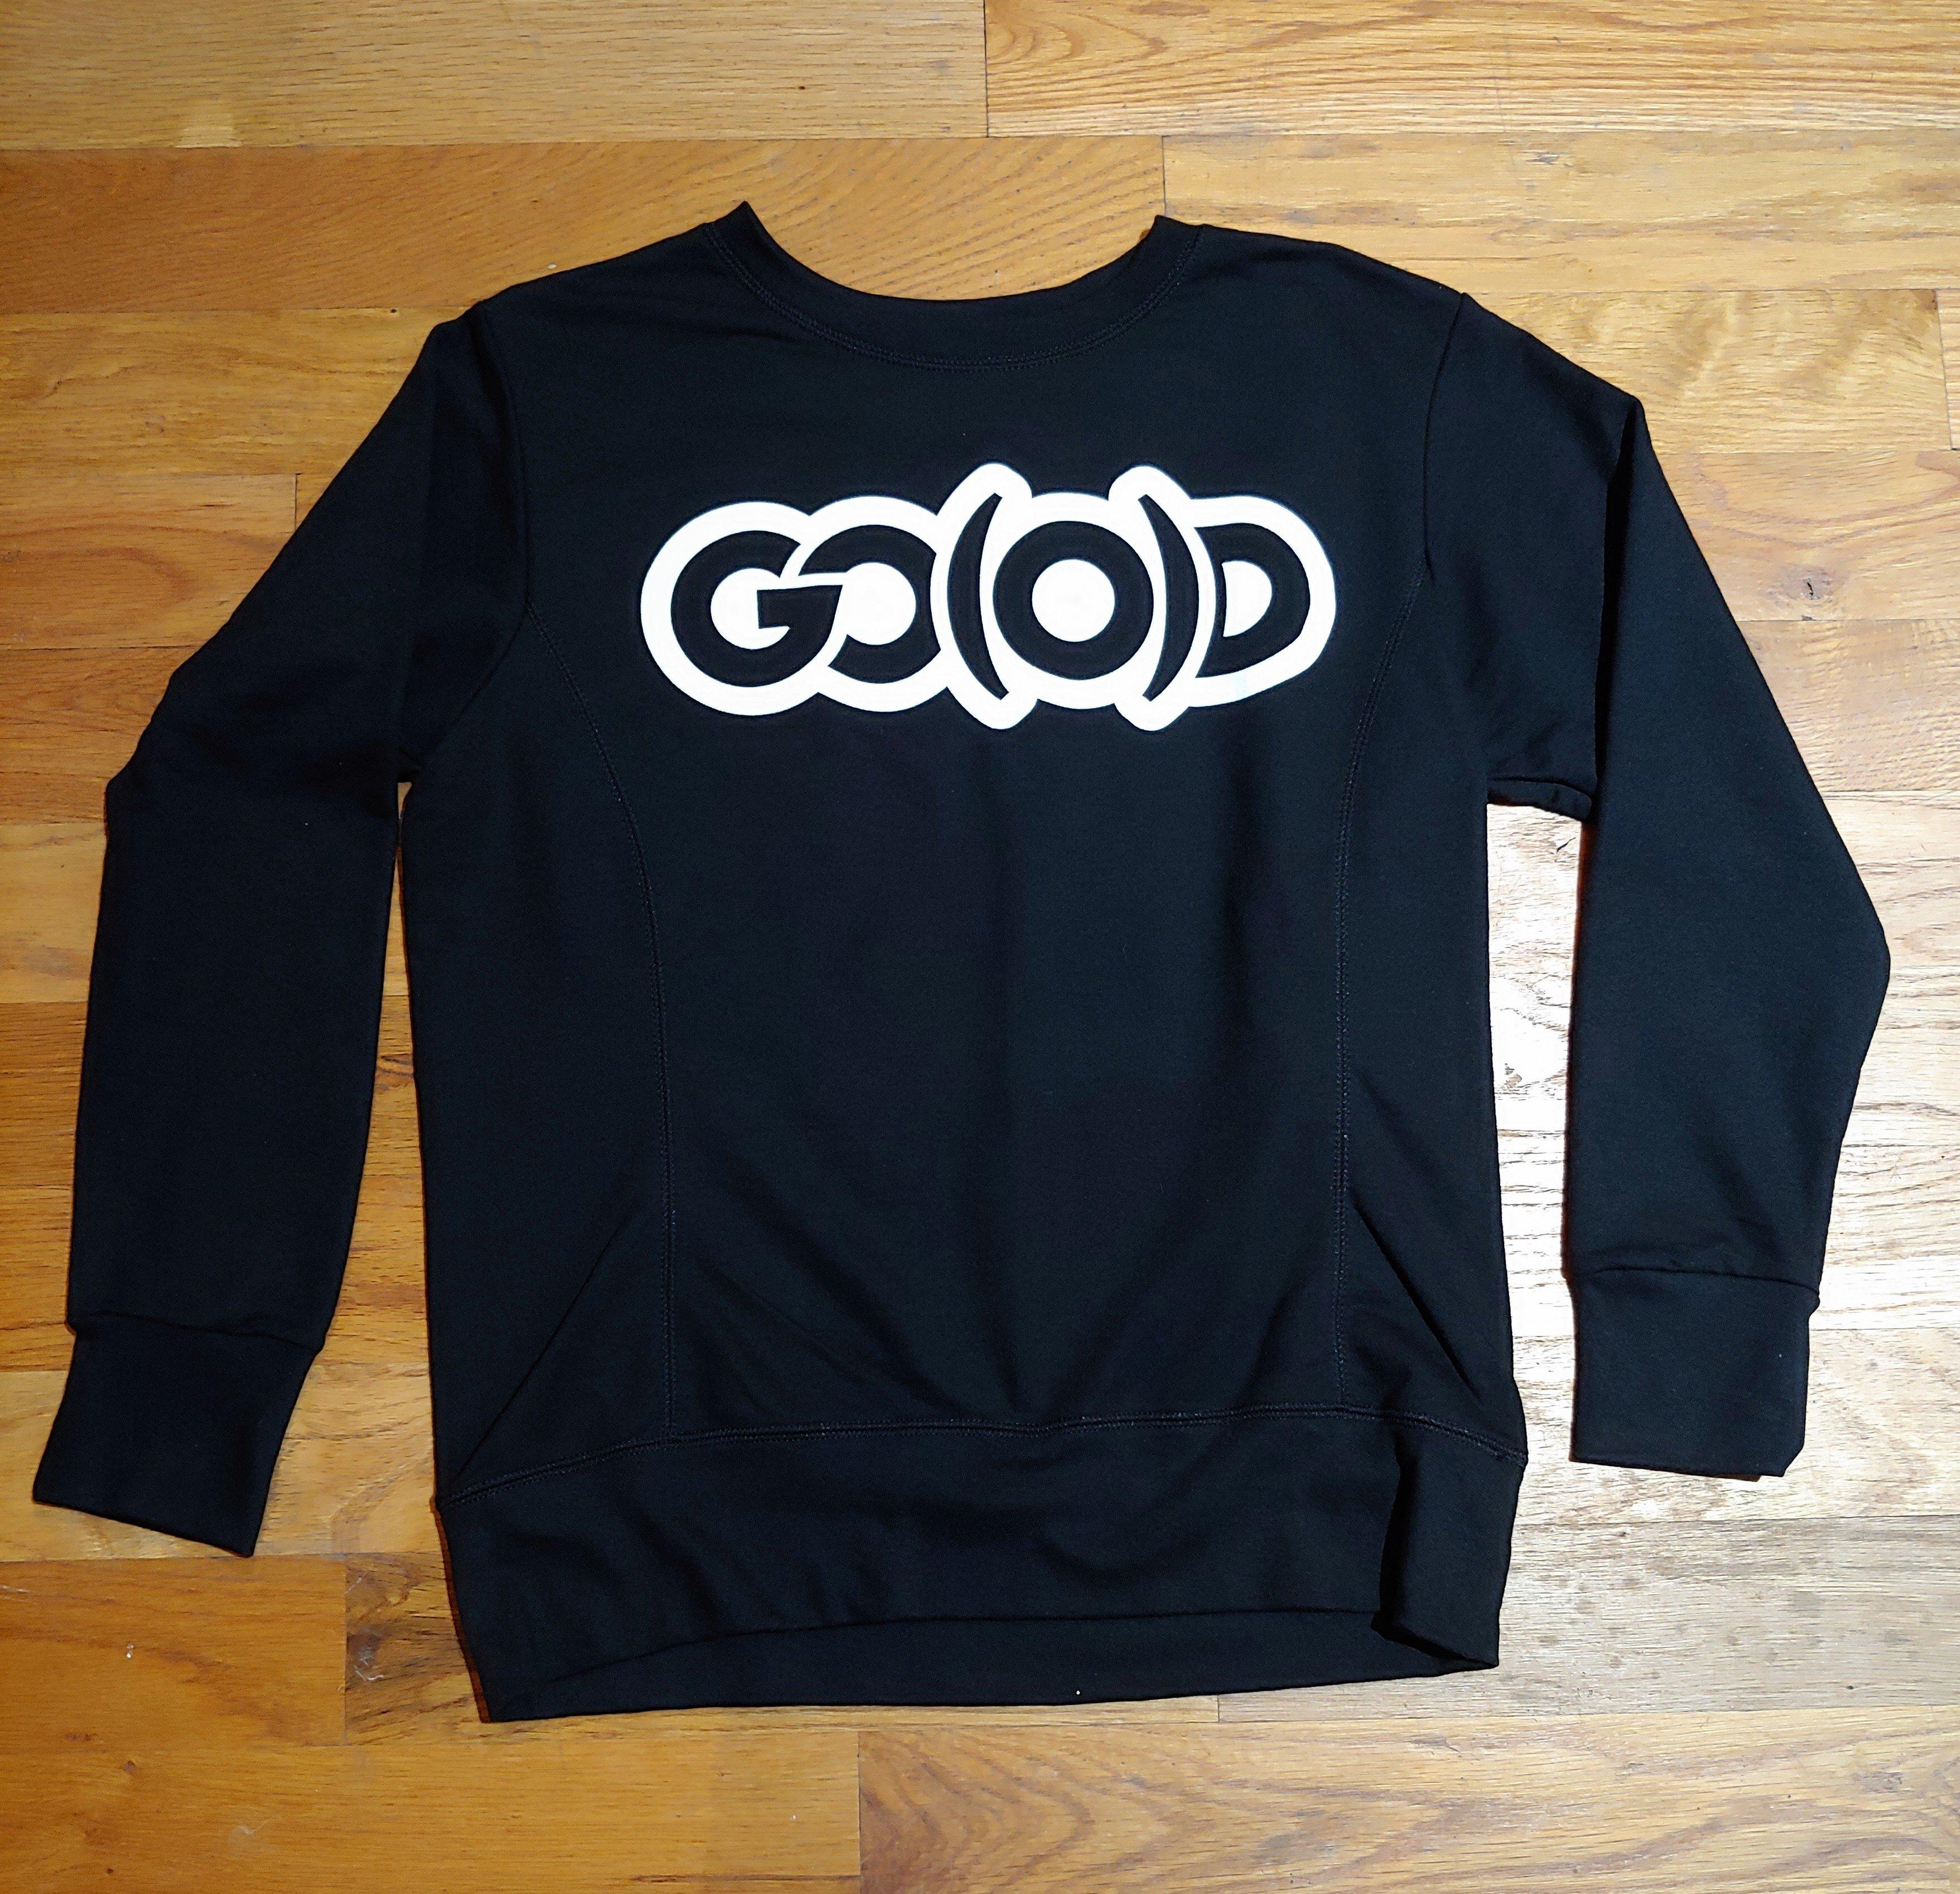 Women's GO(O)D Sweatshirt-Black/white 00184